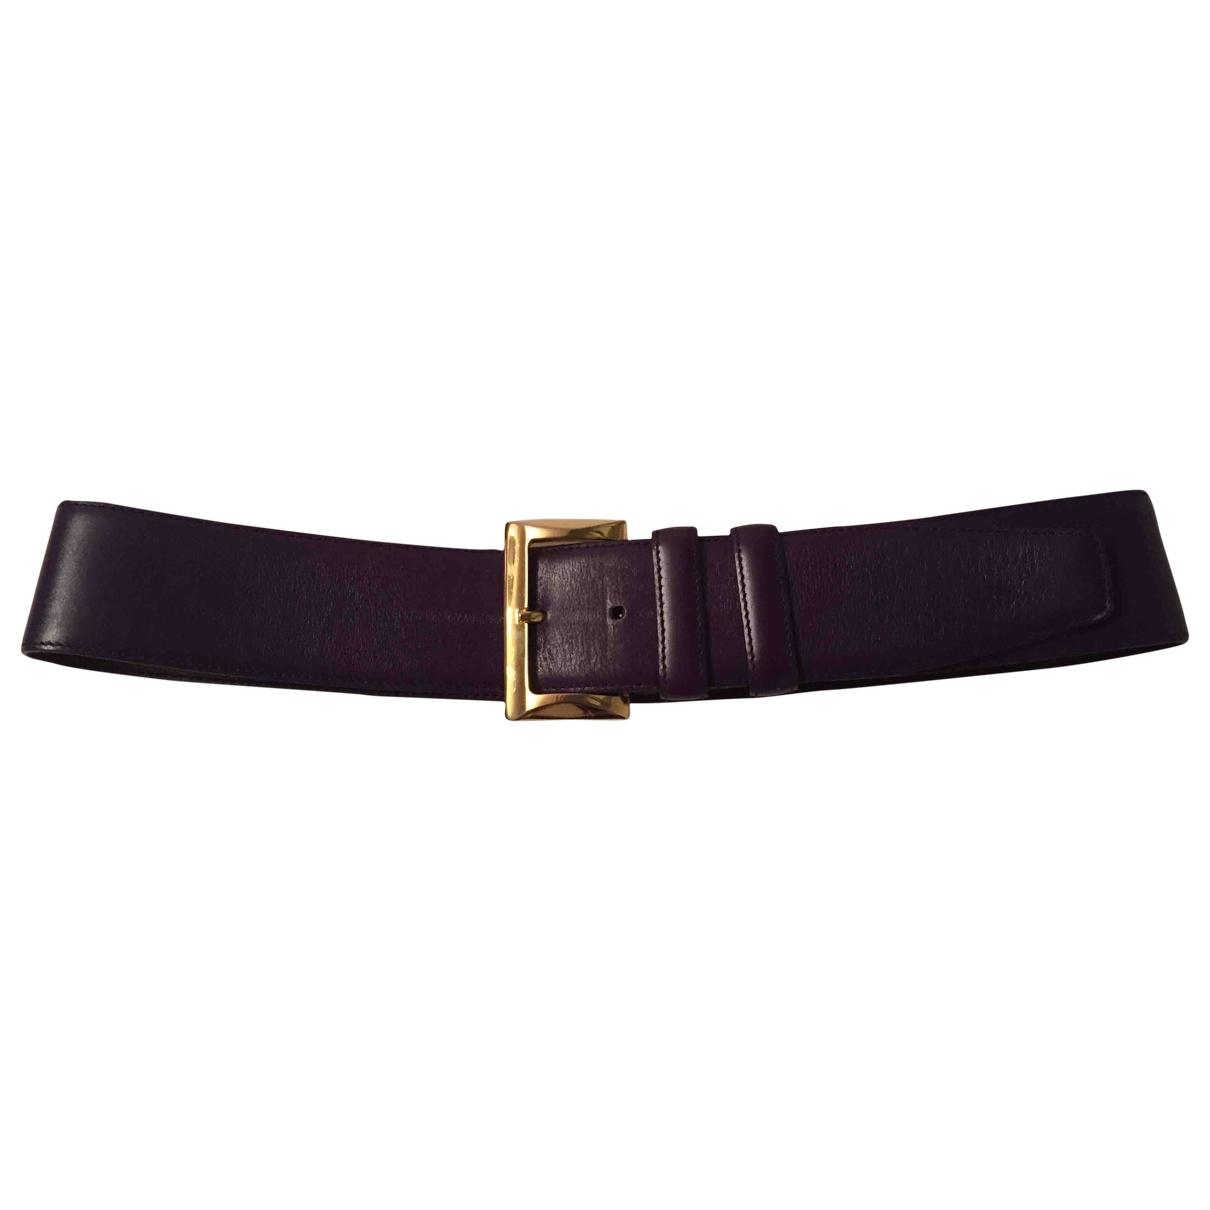 Prada \N Purple Leather belt for Women 75 cm